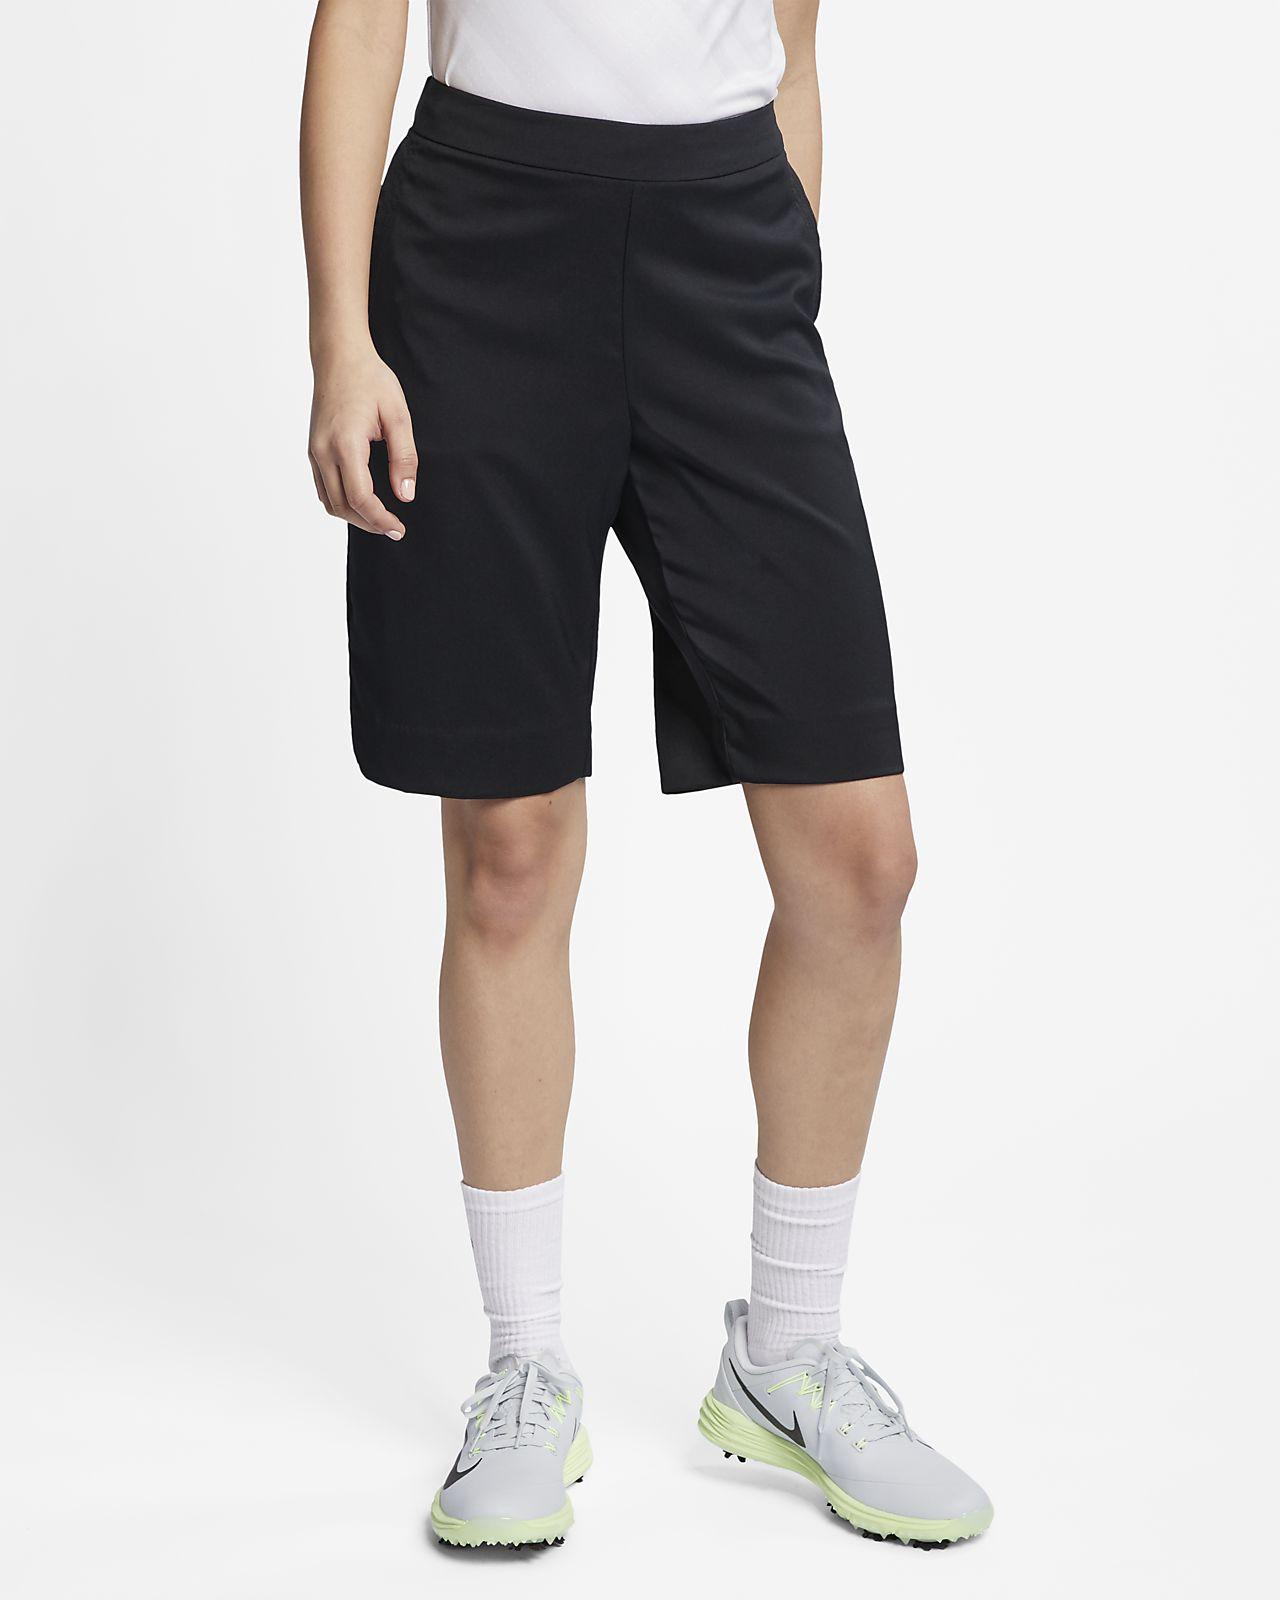 Golf Korte Broek Dames.Nike Dri Fit Uv Golfshorts Voor Dames 28 Cm Nike Com Be